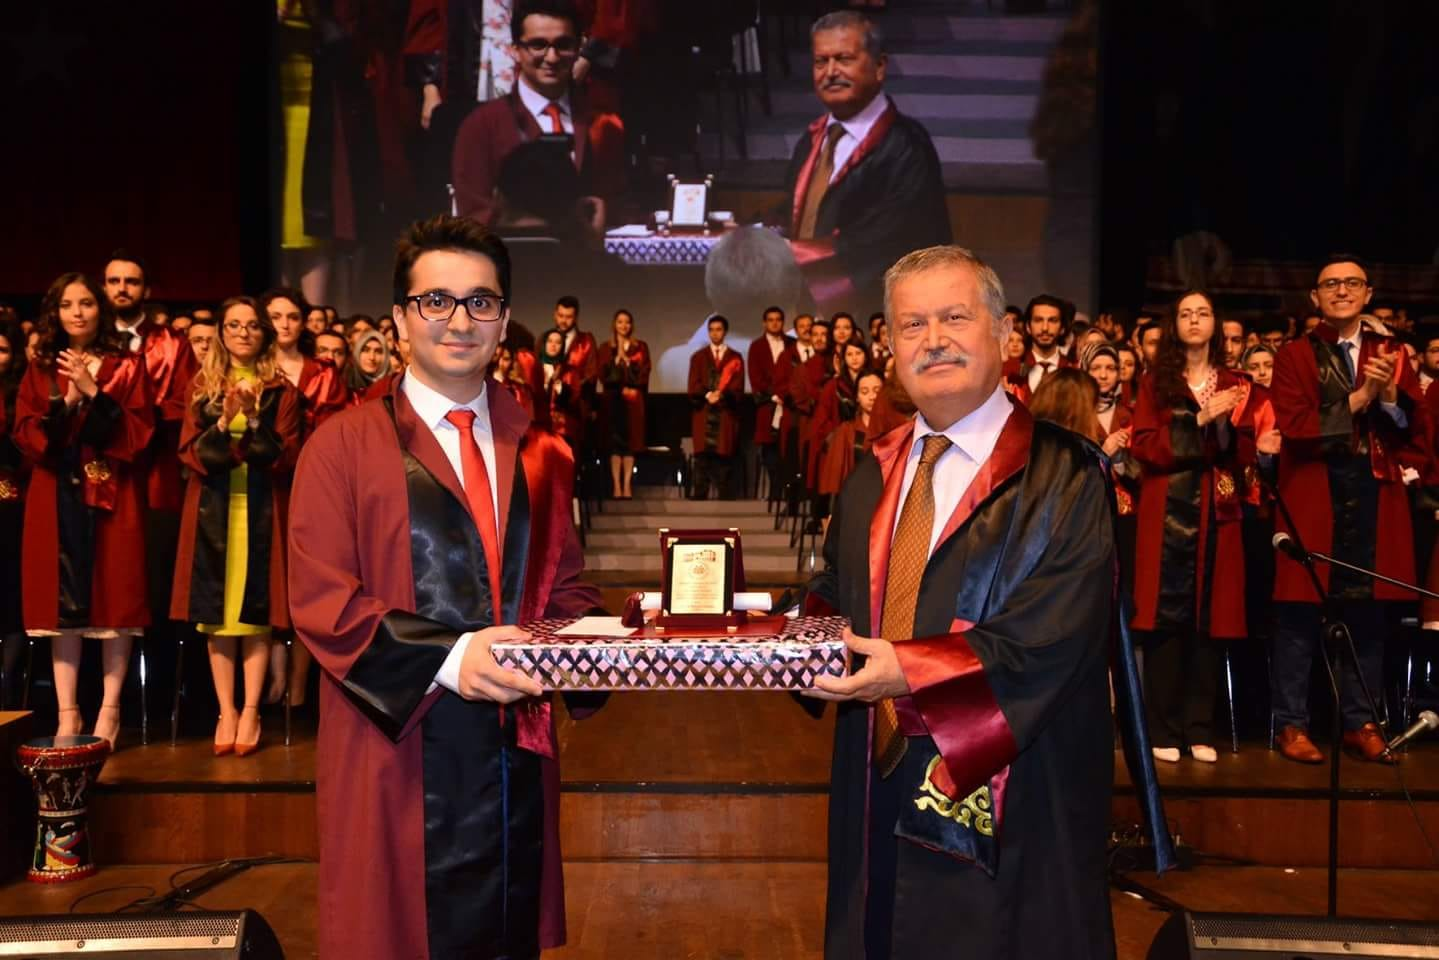 Hem İstanbul Tıp Fakültesi Birincisi, Hem TUS Birincisi